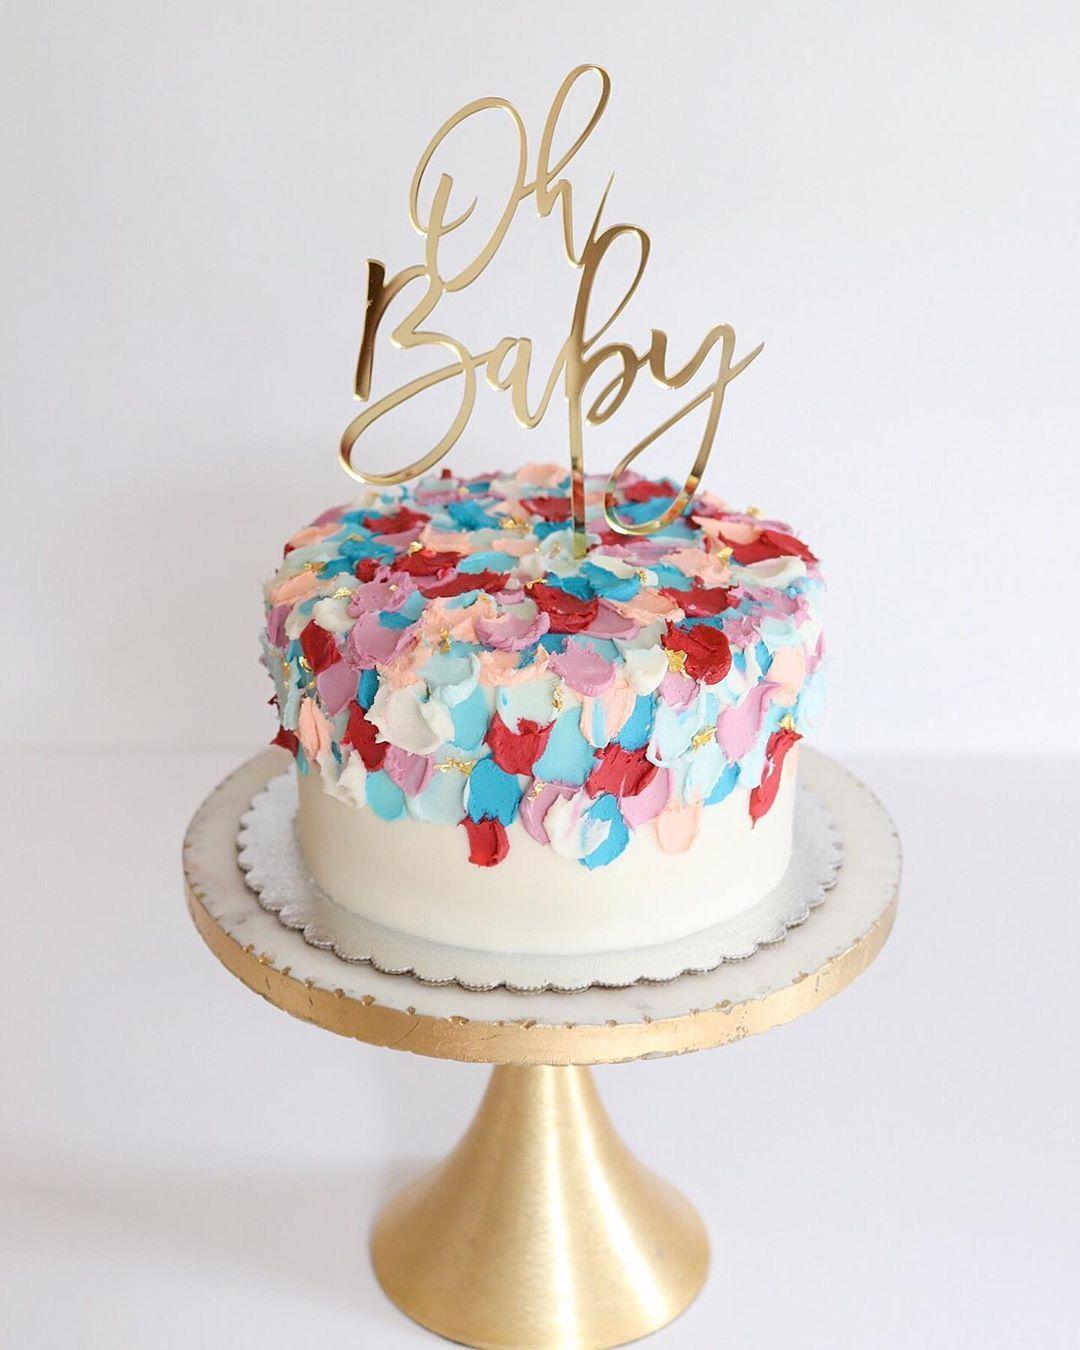 A Sweet Little Modern Gender Reveal Cake Inspired By Sugarandsparrowco Snackyfrench Genderr Gender Reveal Cake Baby Shower Gender Reveal Cake Cake